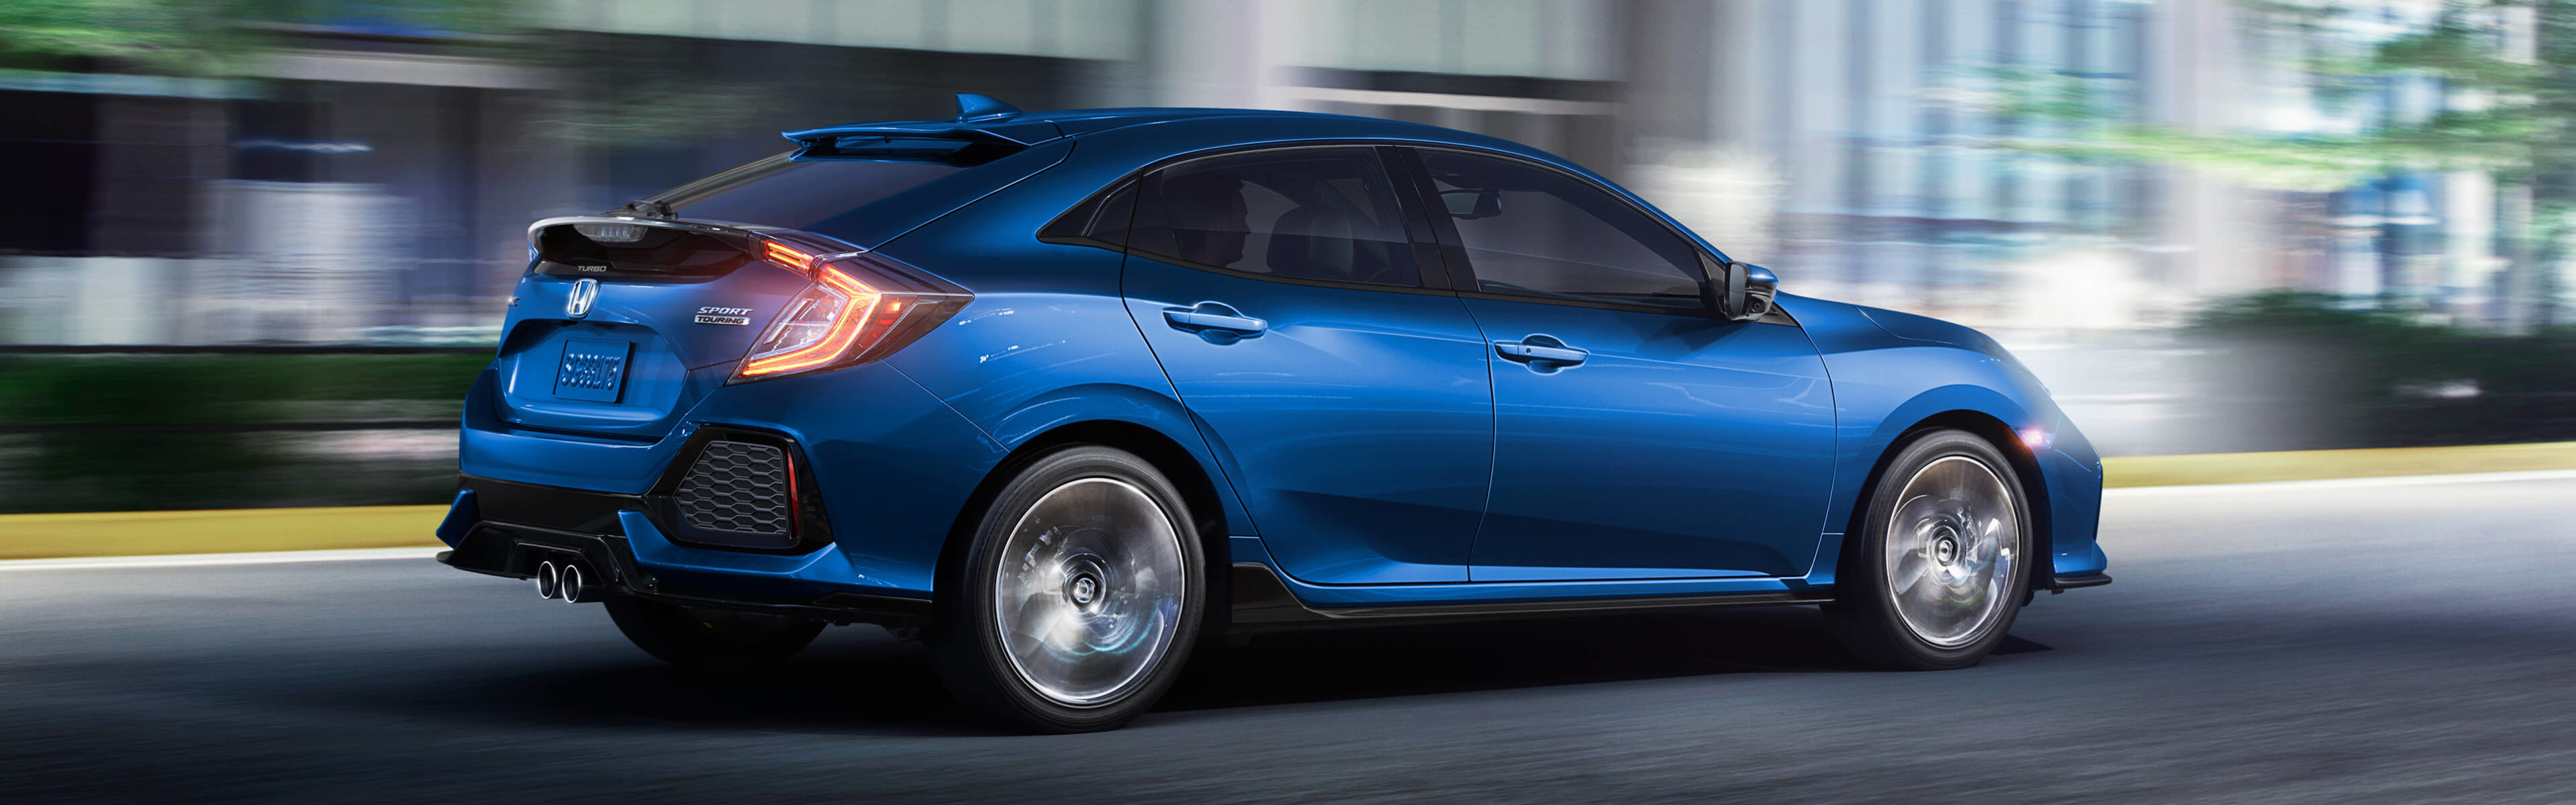 2019 Honda Civic Hatchback Gore Motors Honda